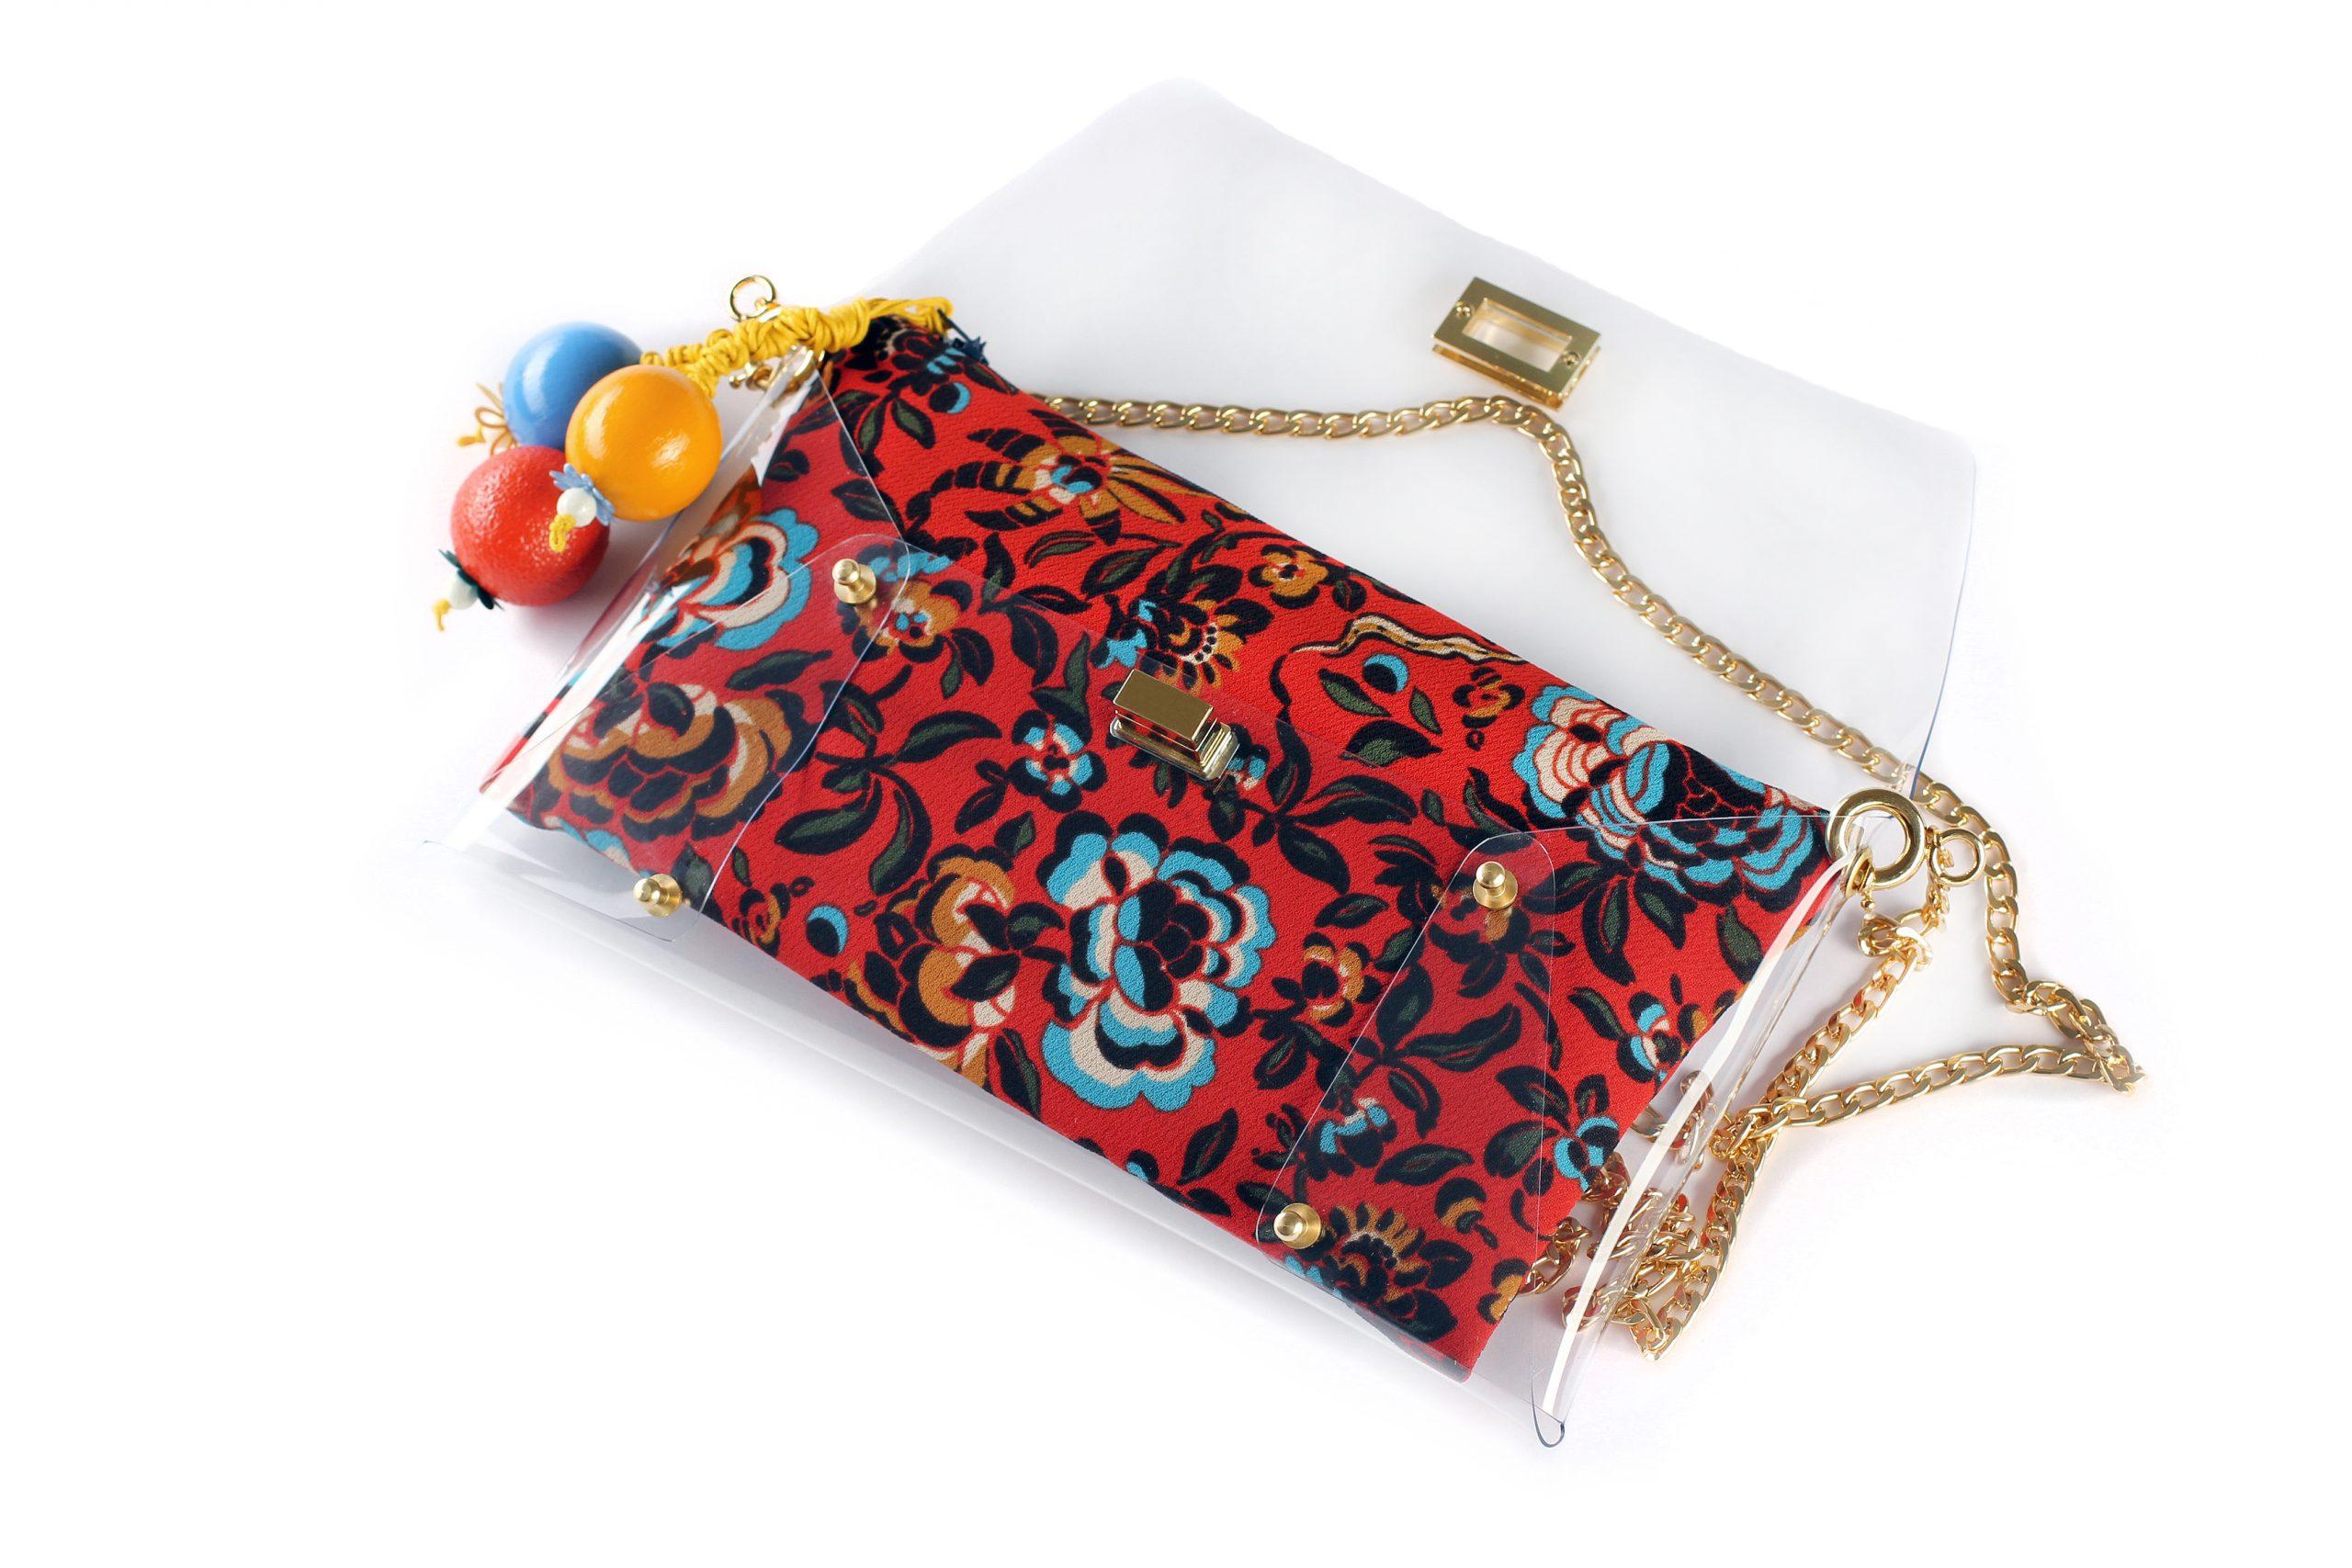 Women Hand Bags - CLutch bags - Handbags Made in Ireland